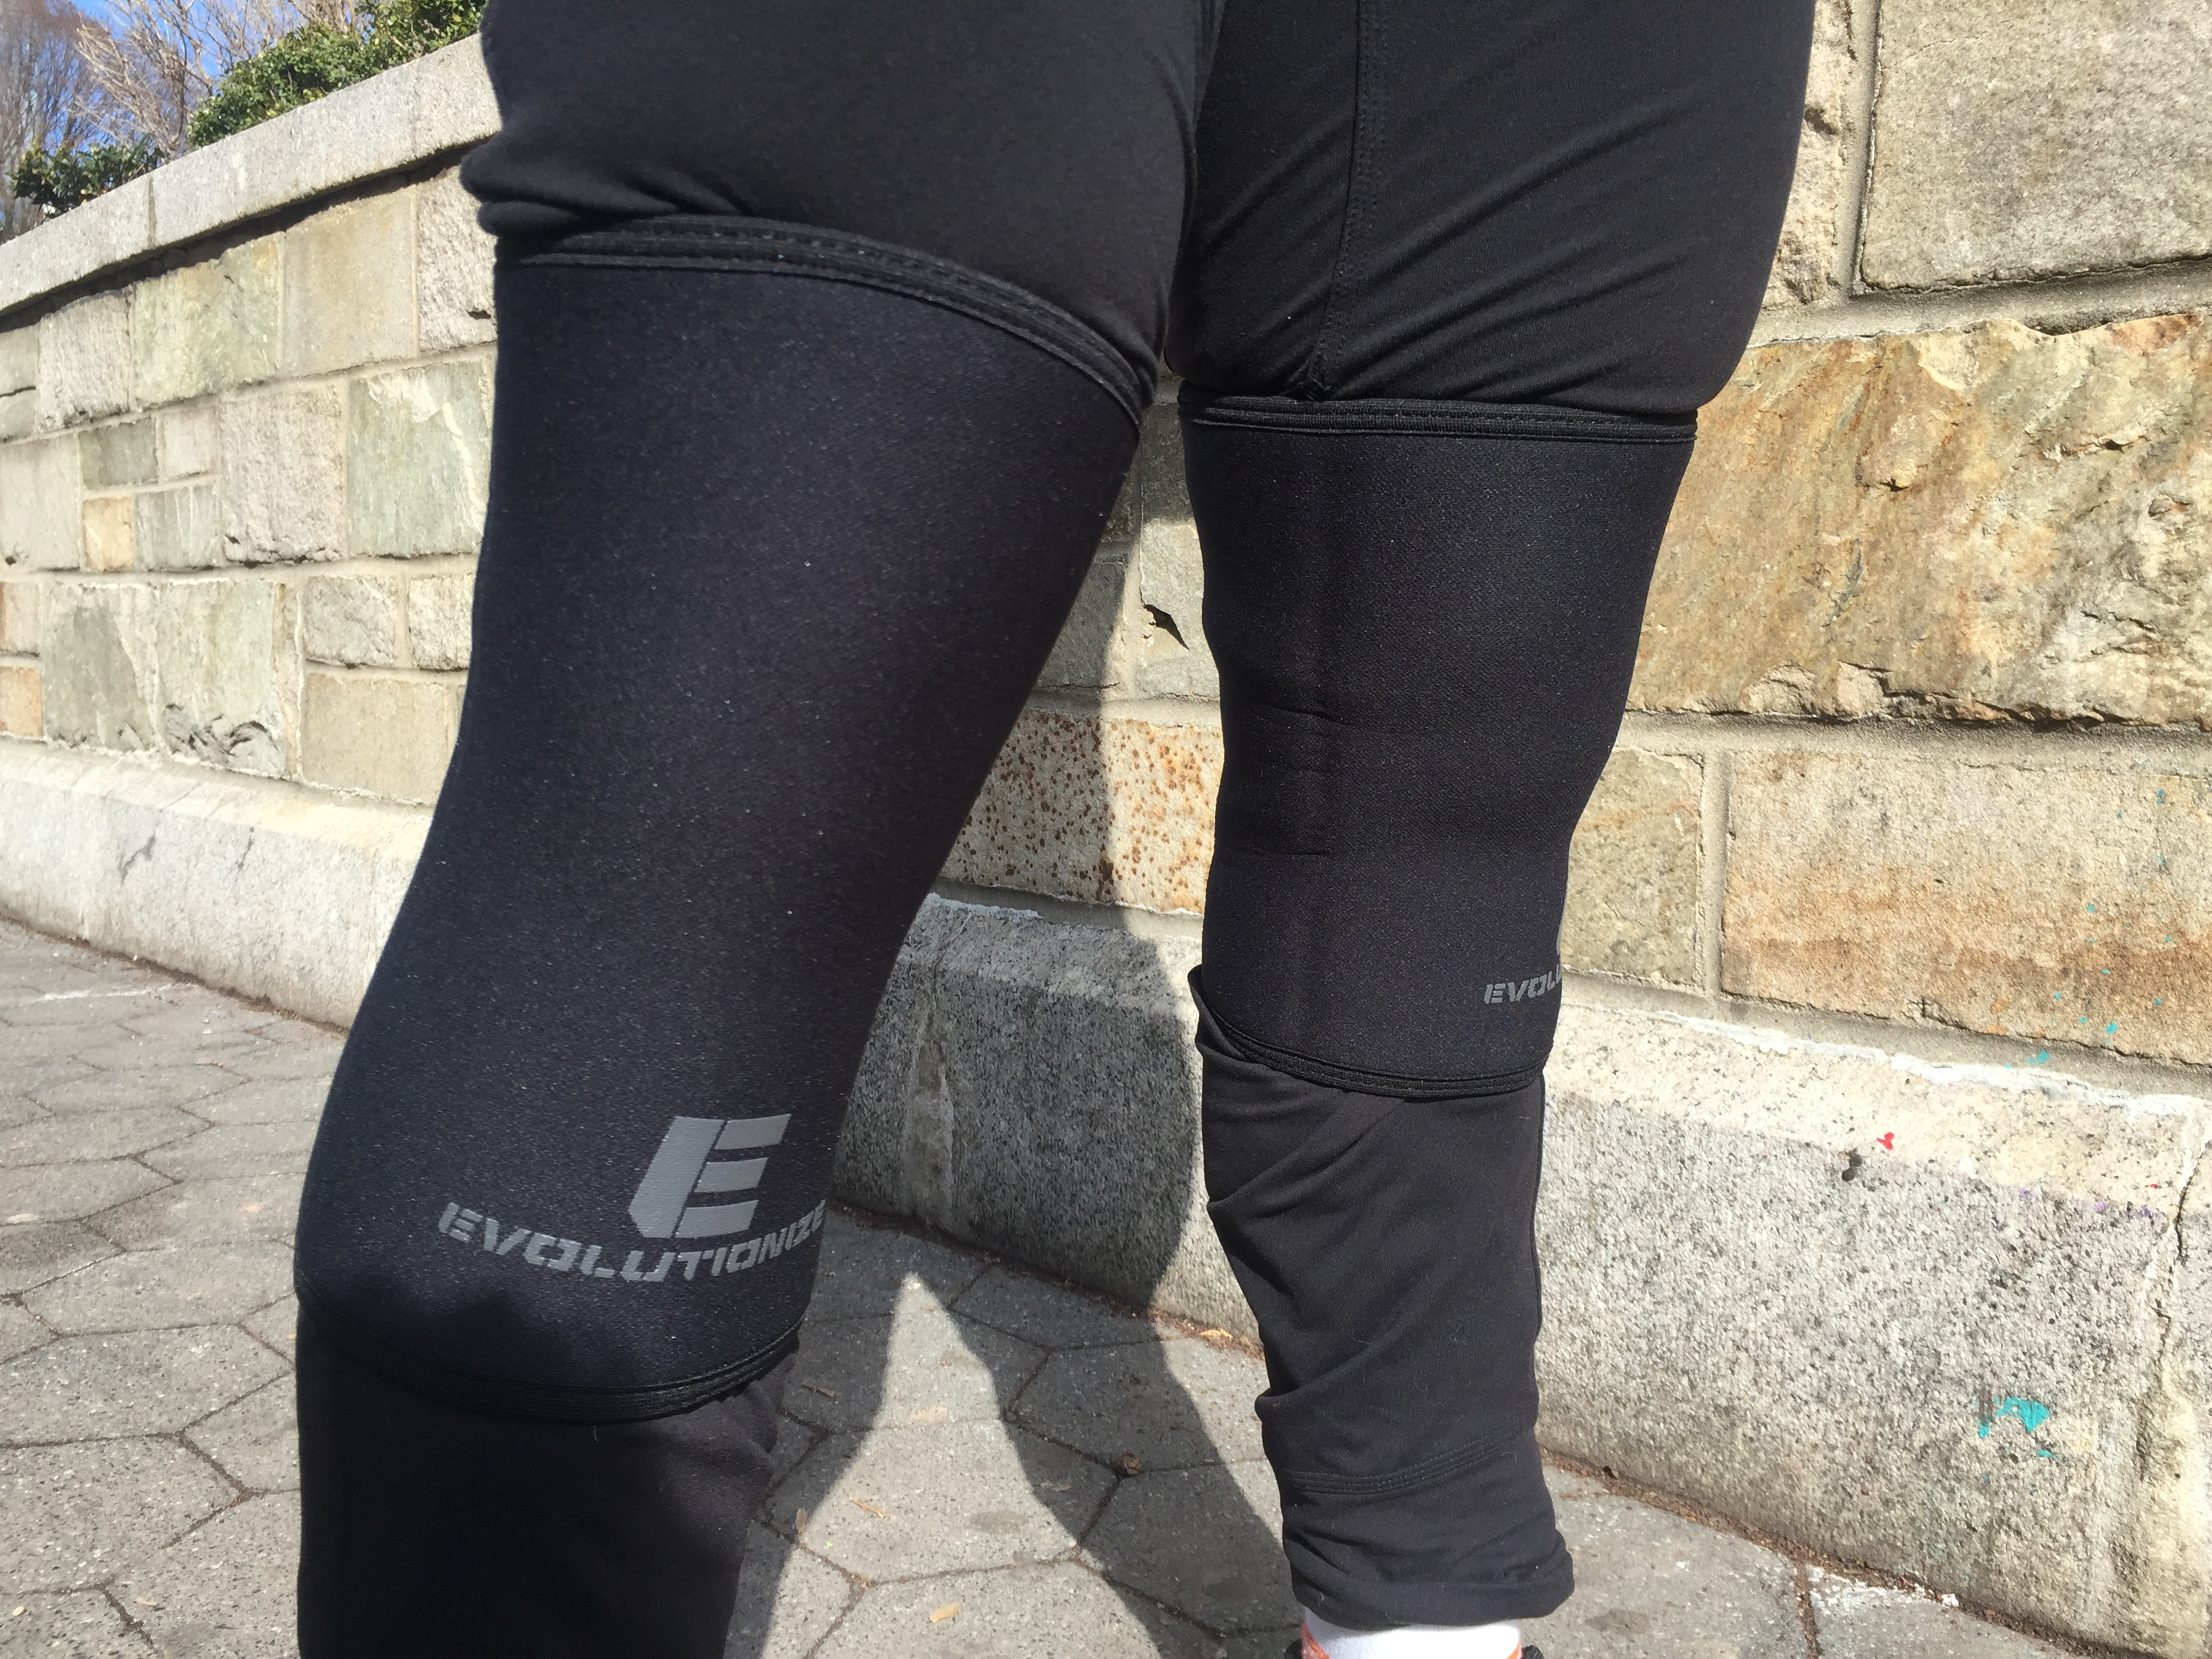 Evolutionize Knee Sleeves Fit